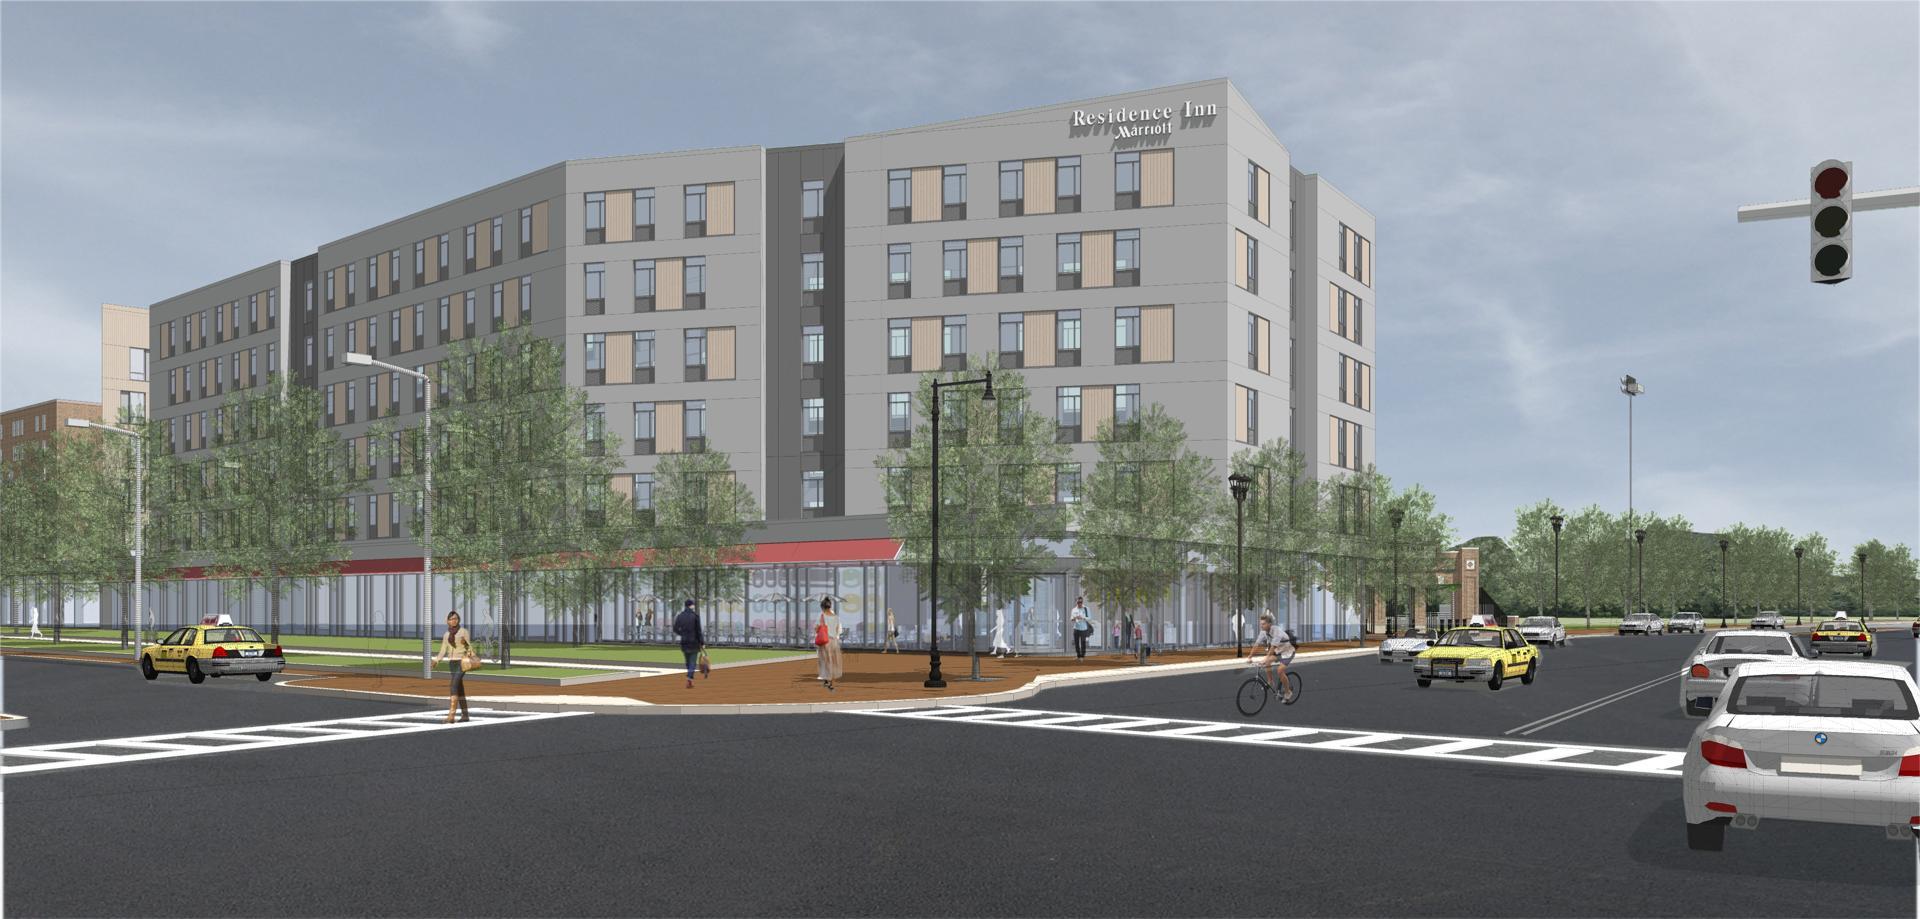 Melnea hotel and residences marriott residence inn washington street melnea cass boulevard boston roxbury urbanica development